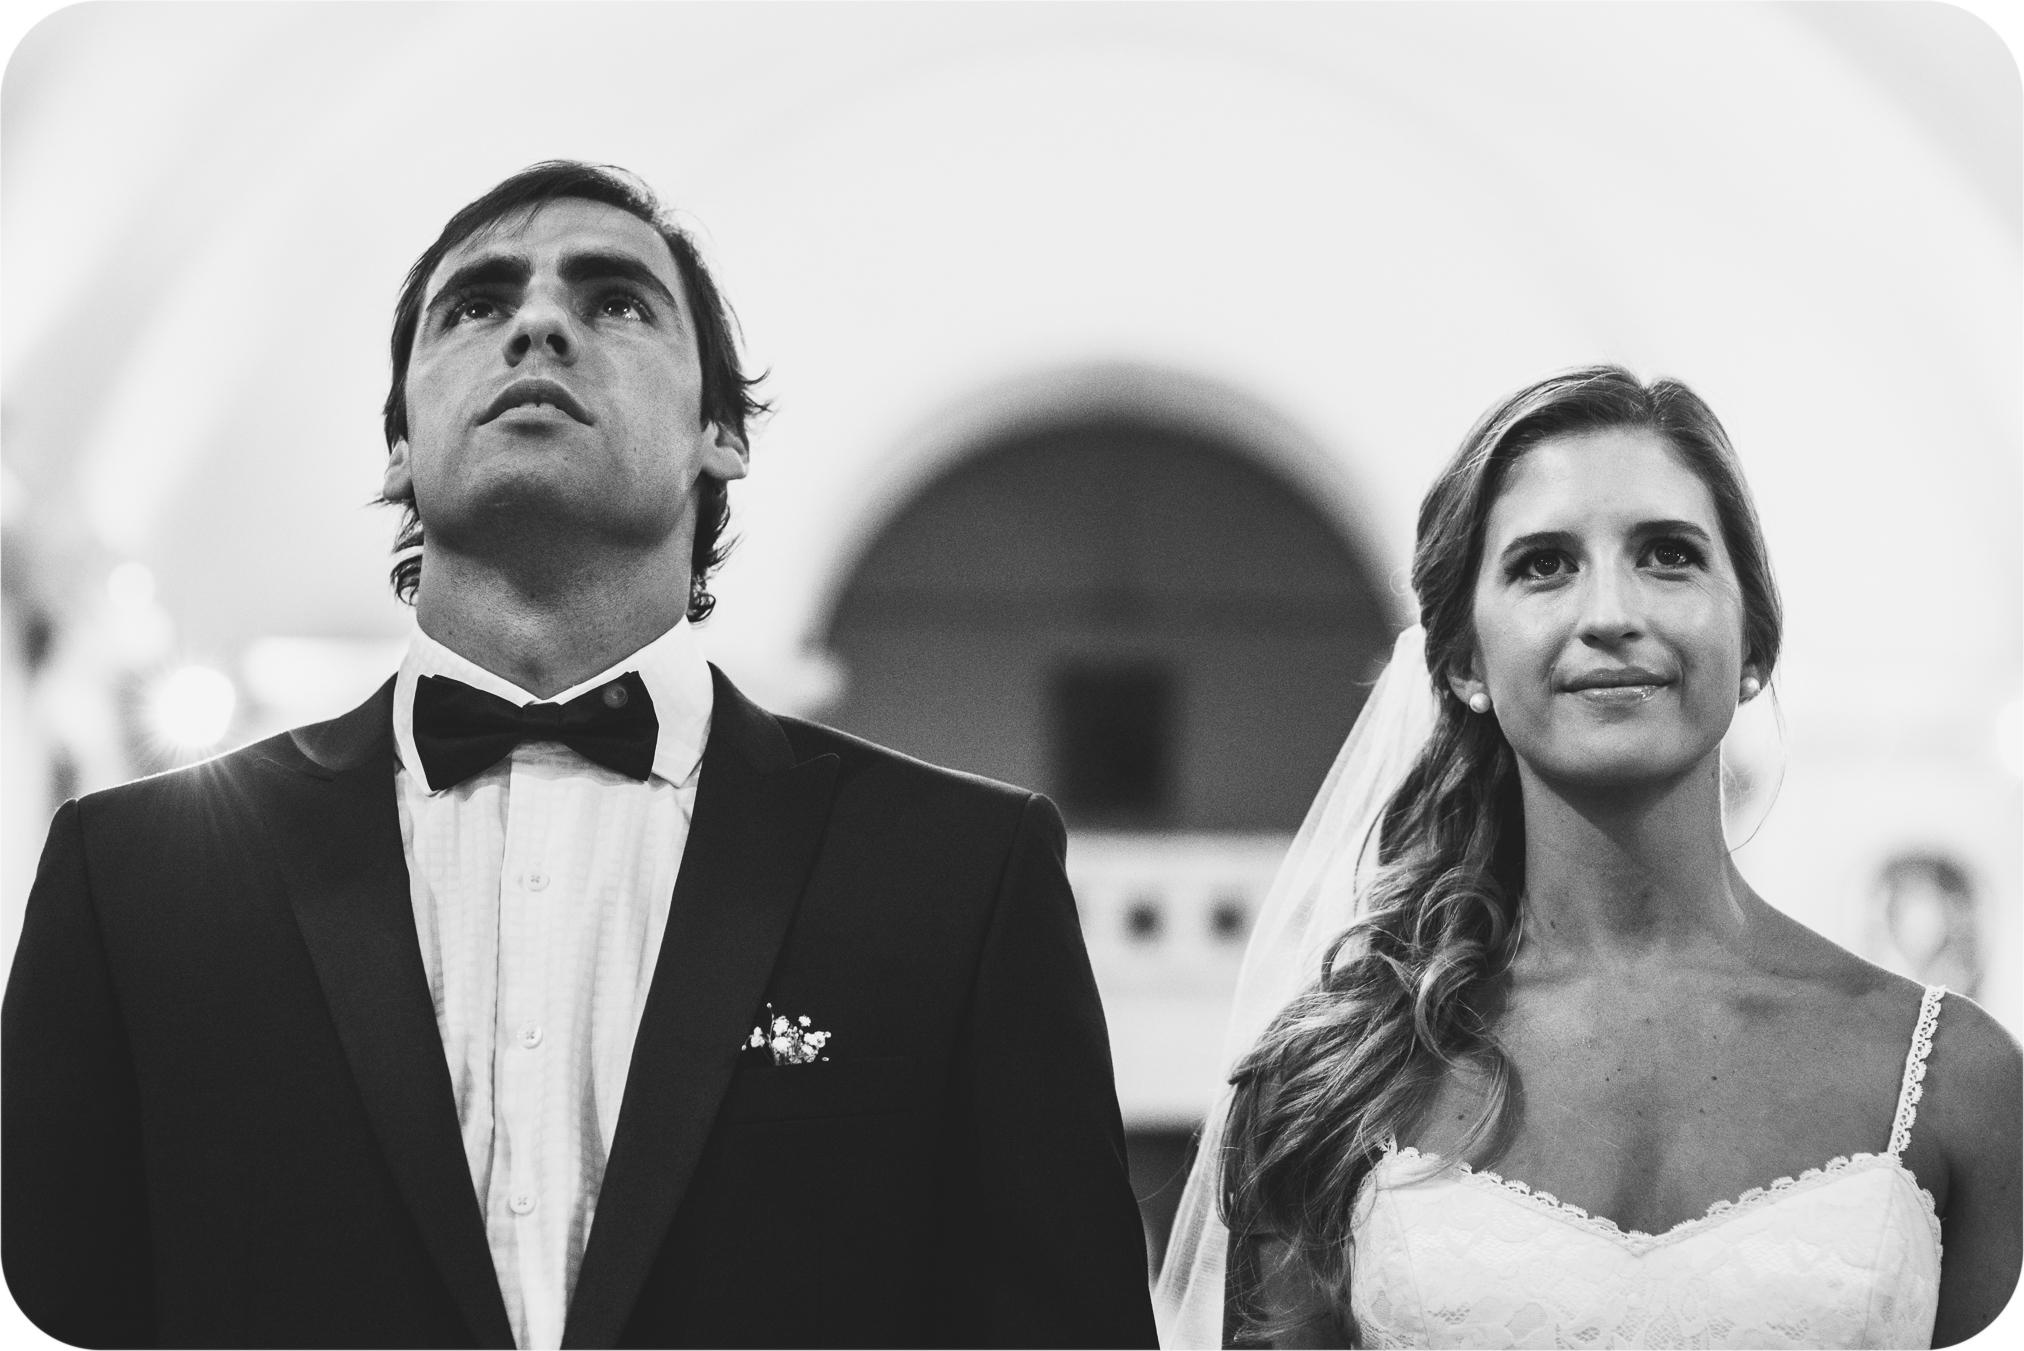 fotógrafo ceremonia religiosa casamiento | Maxi Oviedo